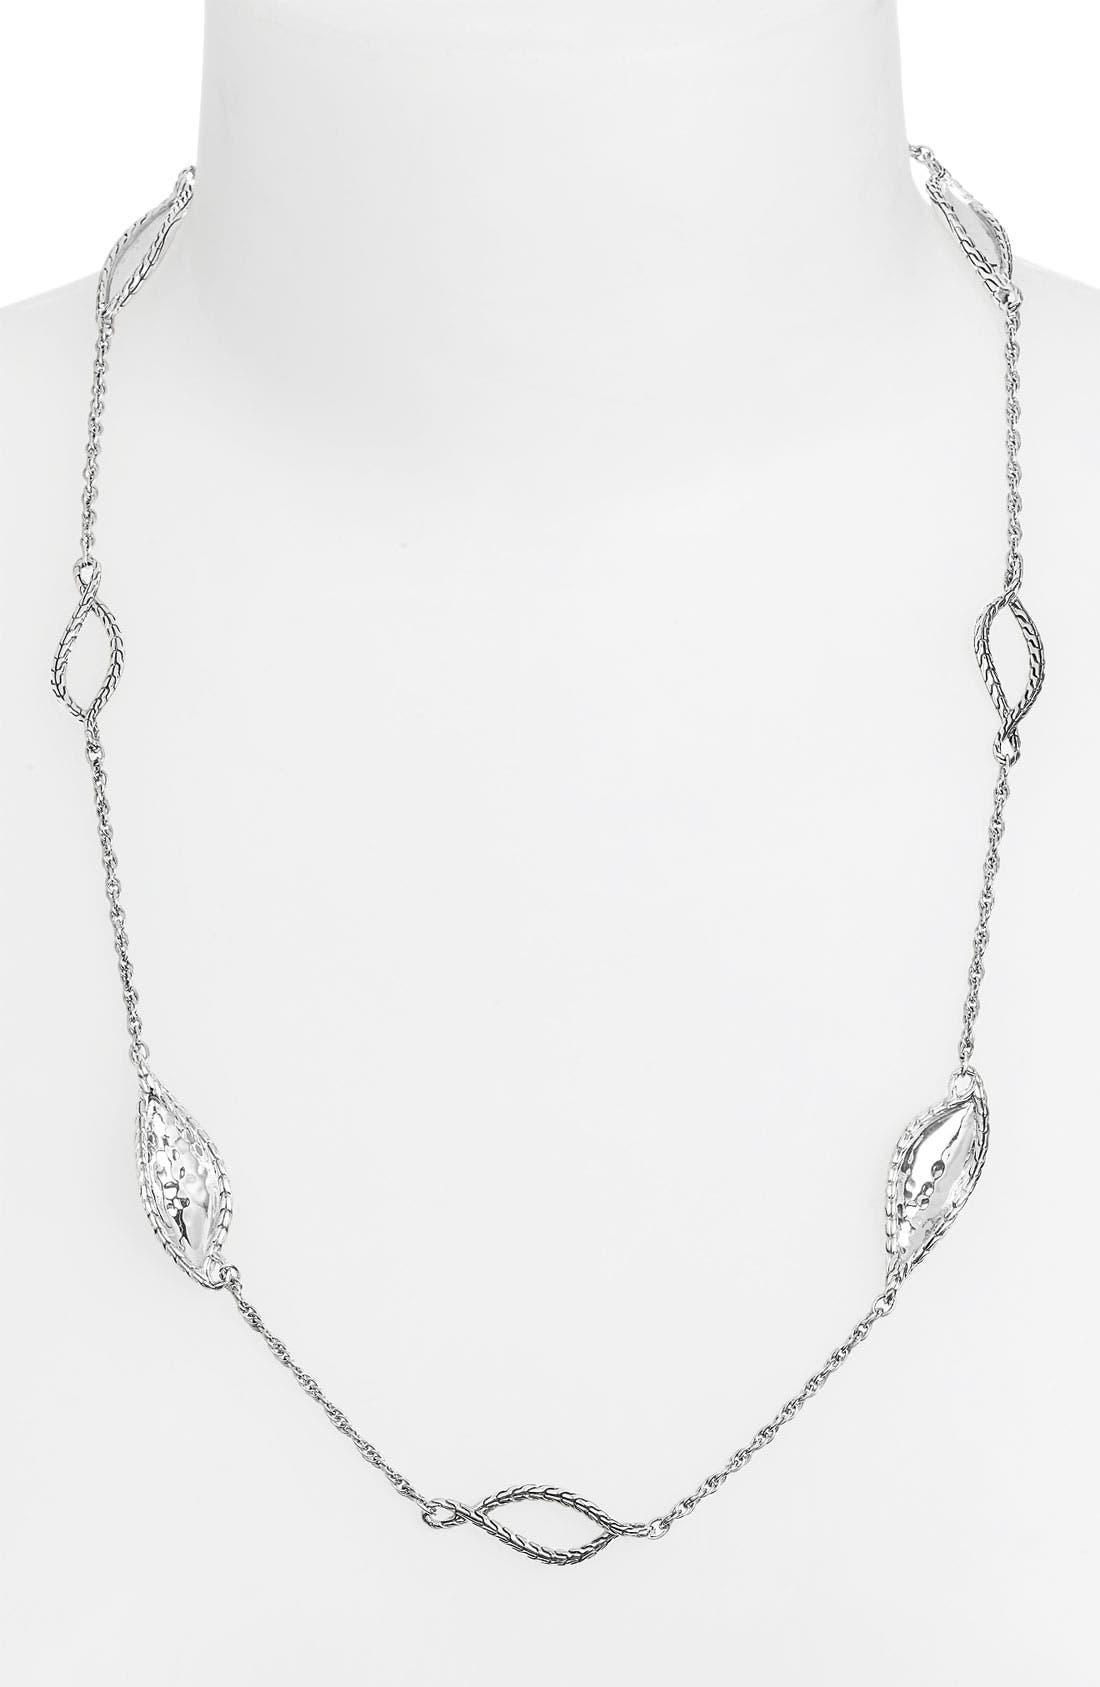 Main Image - John Hardy 'Palu' 8-Station Sautoir Necklace